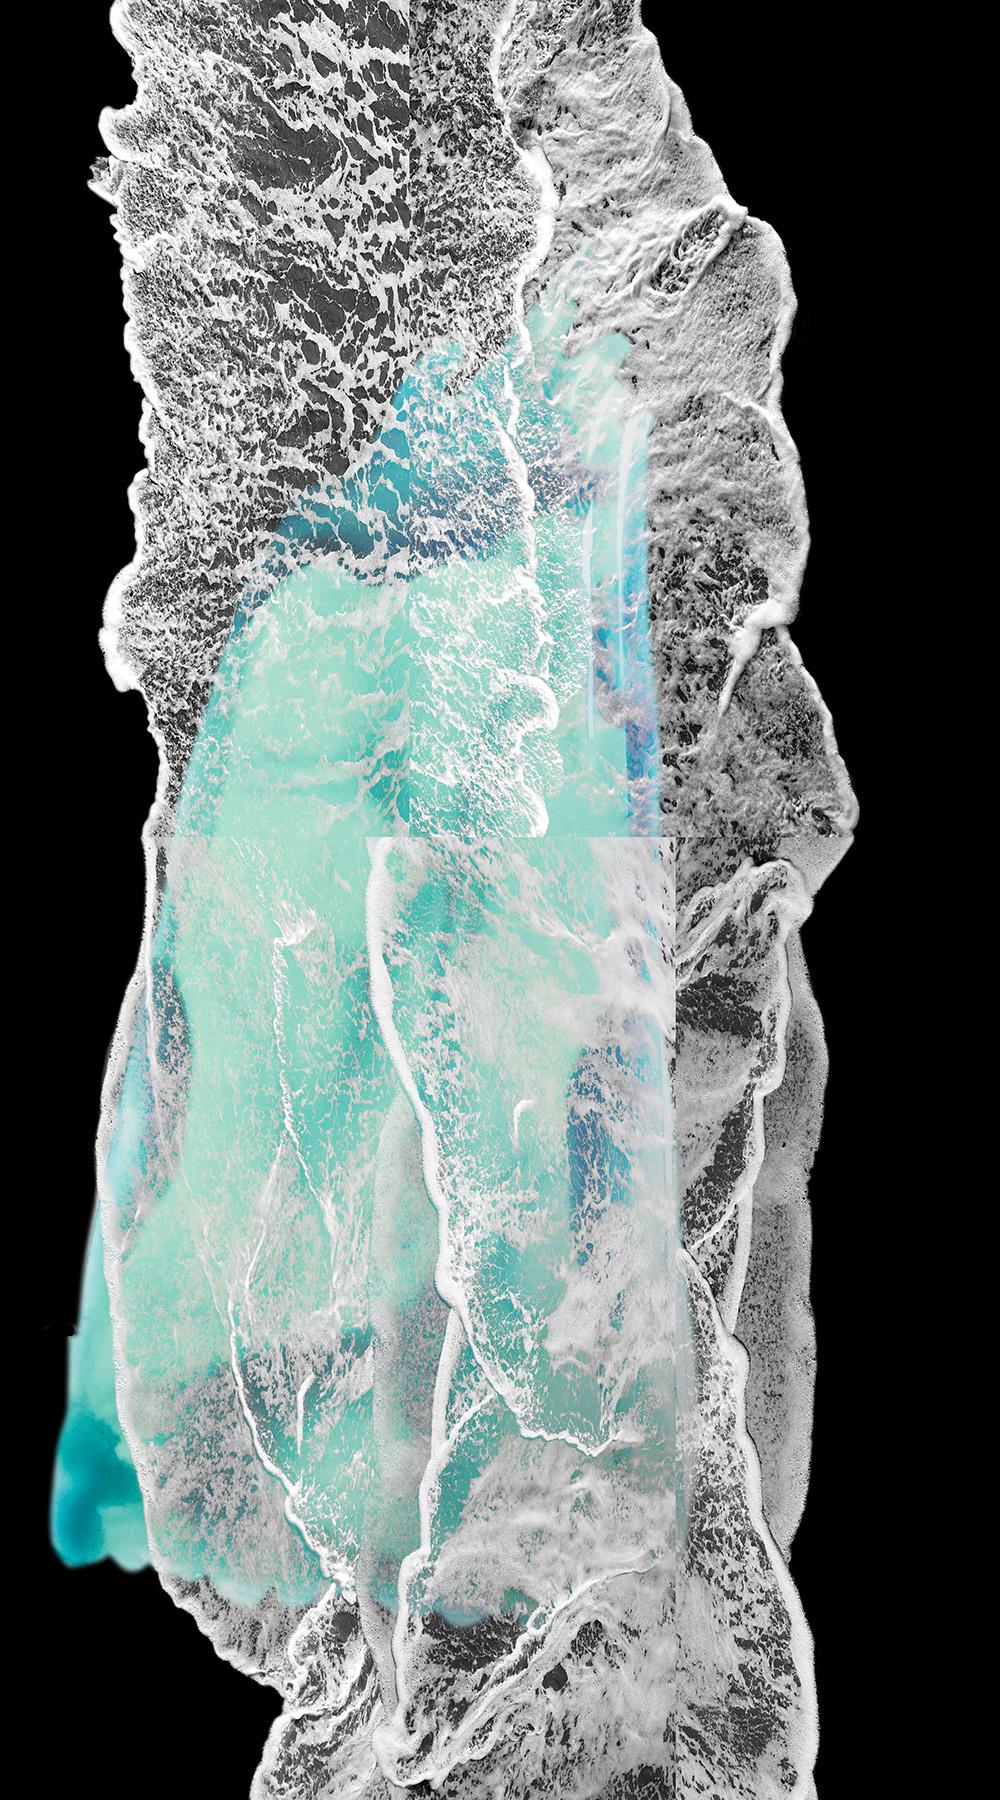 AquaIce1.jpg